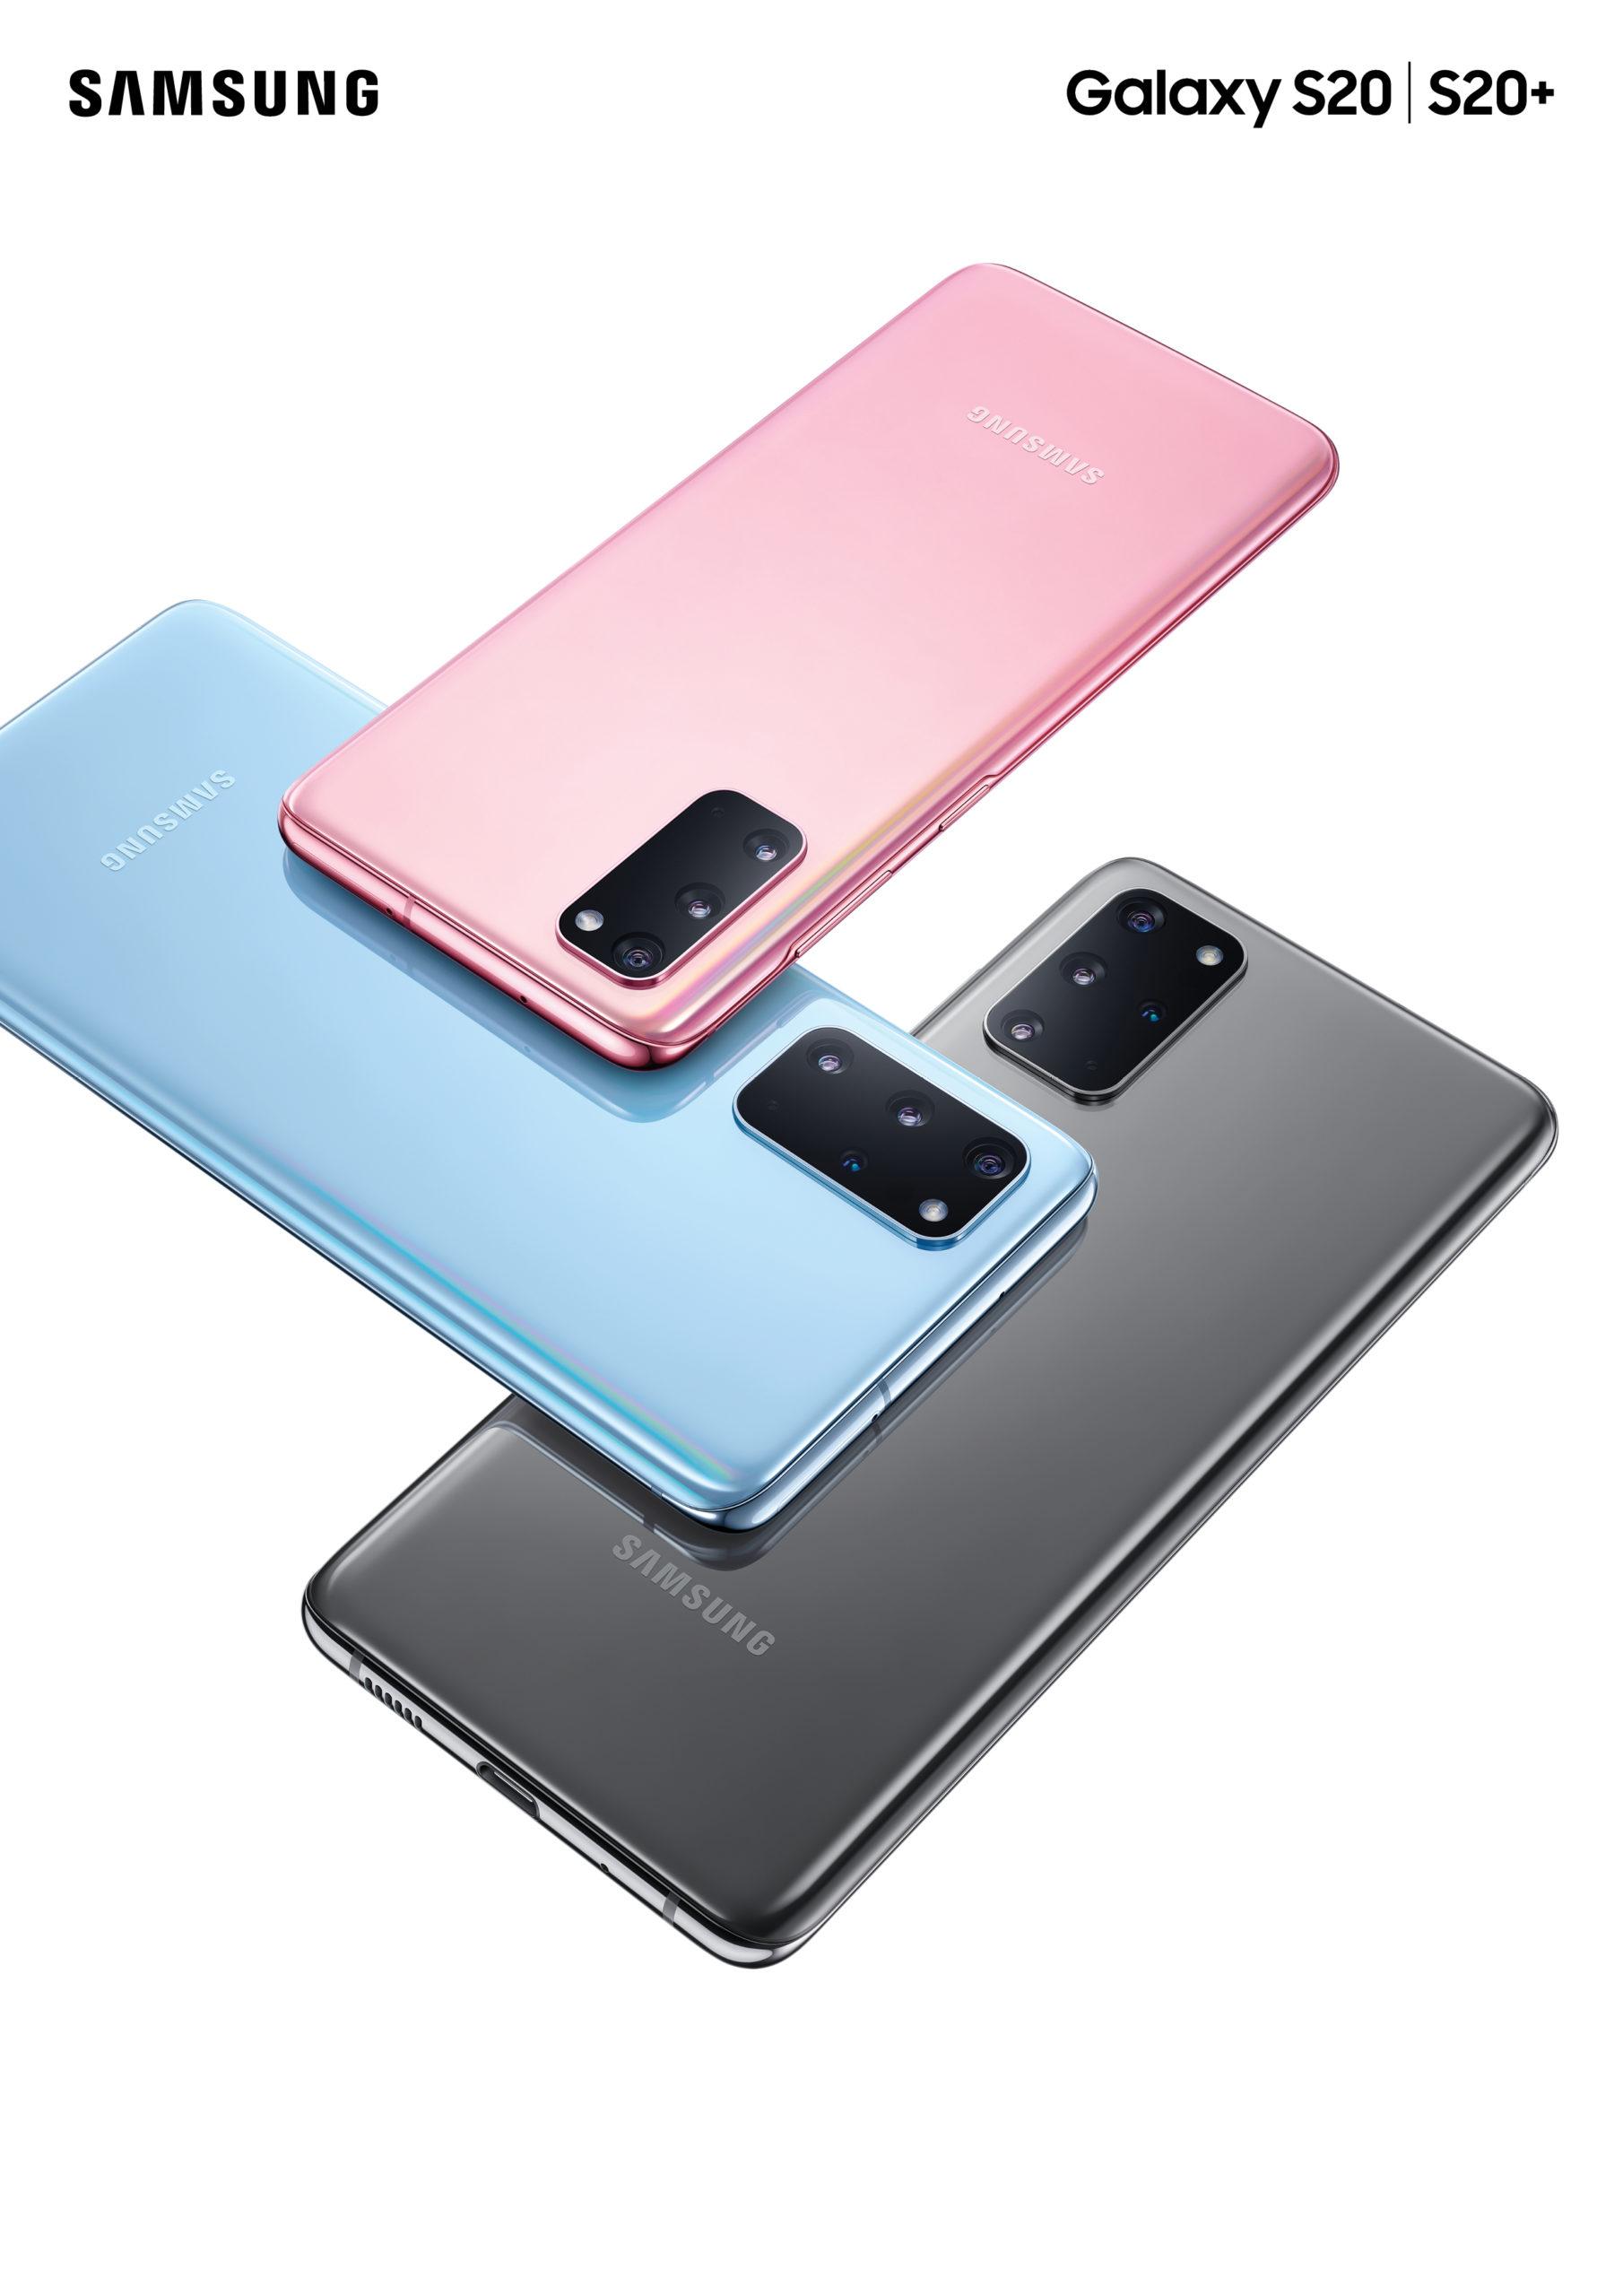 Samsung Galaxy S20 S20+ S20 Ultra 5